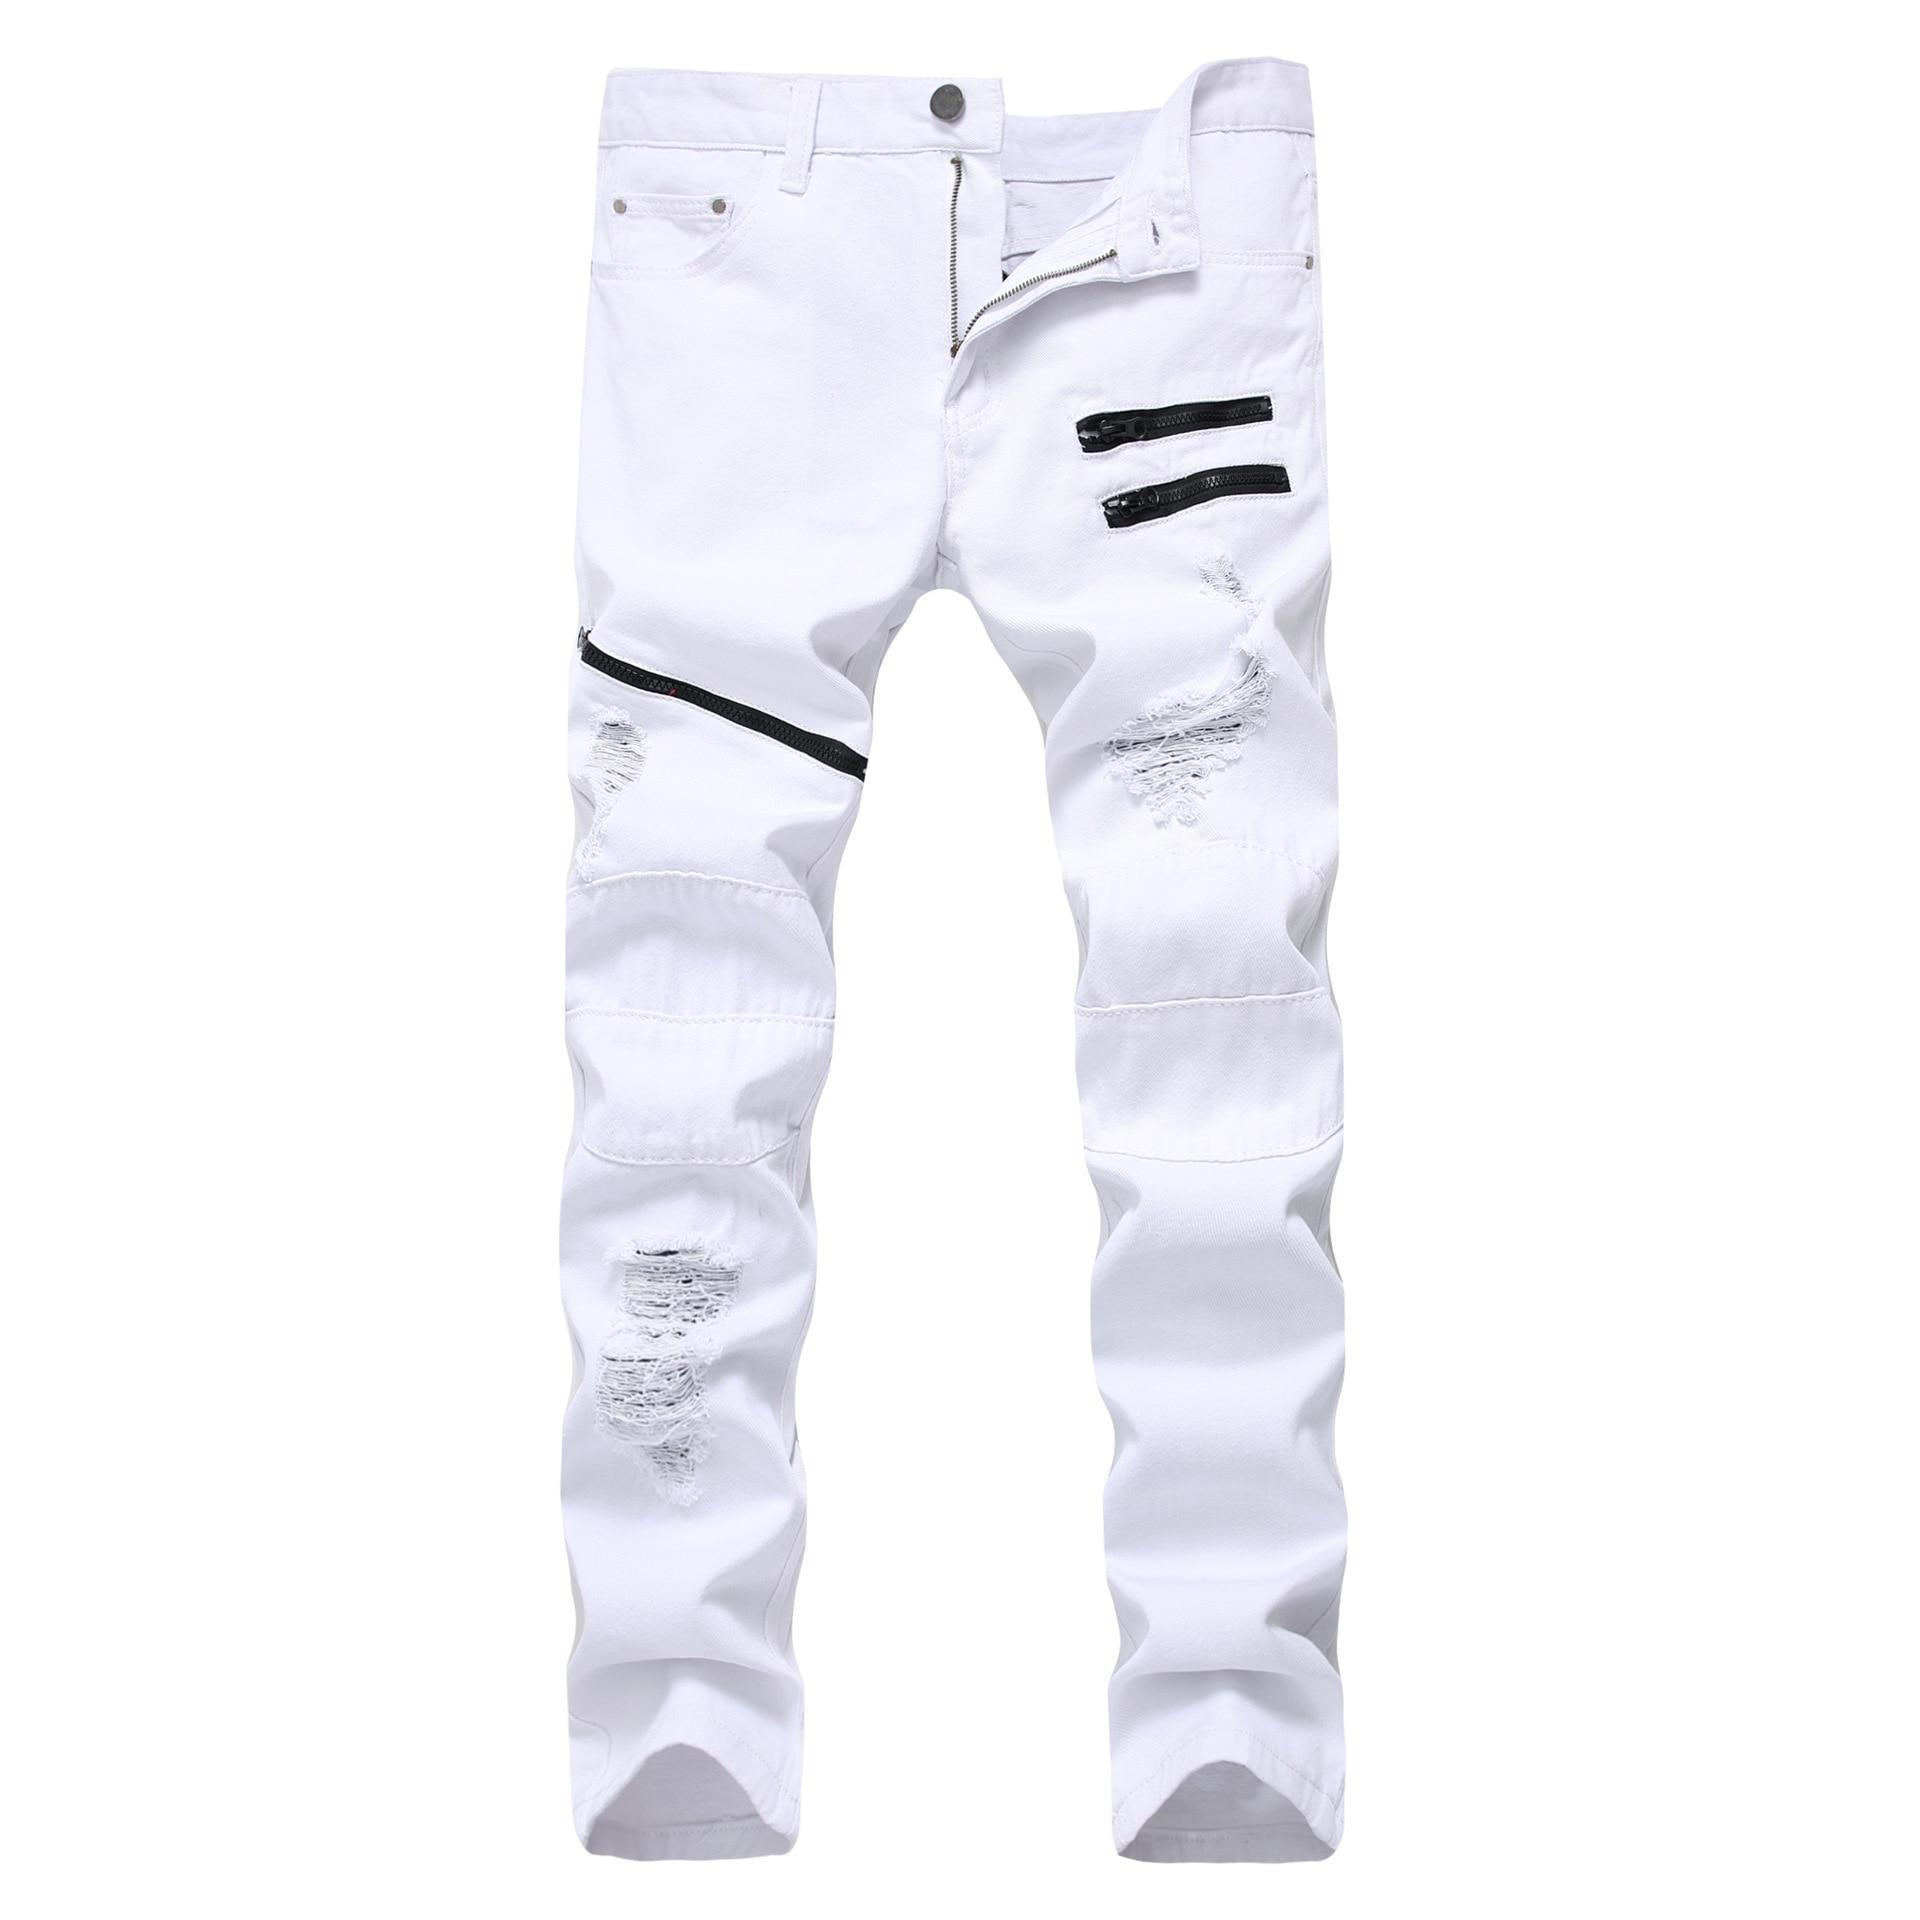 White Red Hole Slim Skinny men's Ripped Jeans Multiple Zipper Decoration Casual Hip Hop Jeans Men Streetwear Denim Trousers